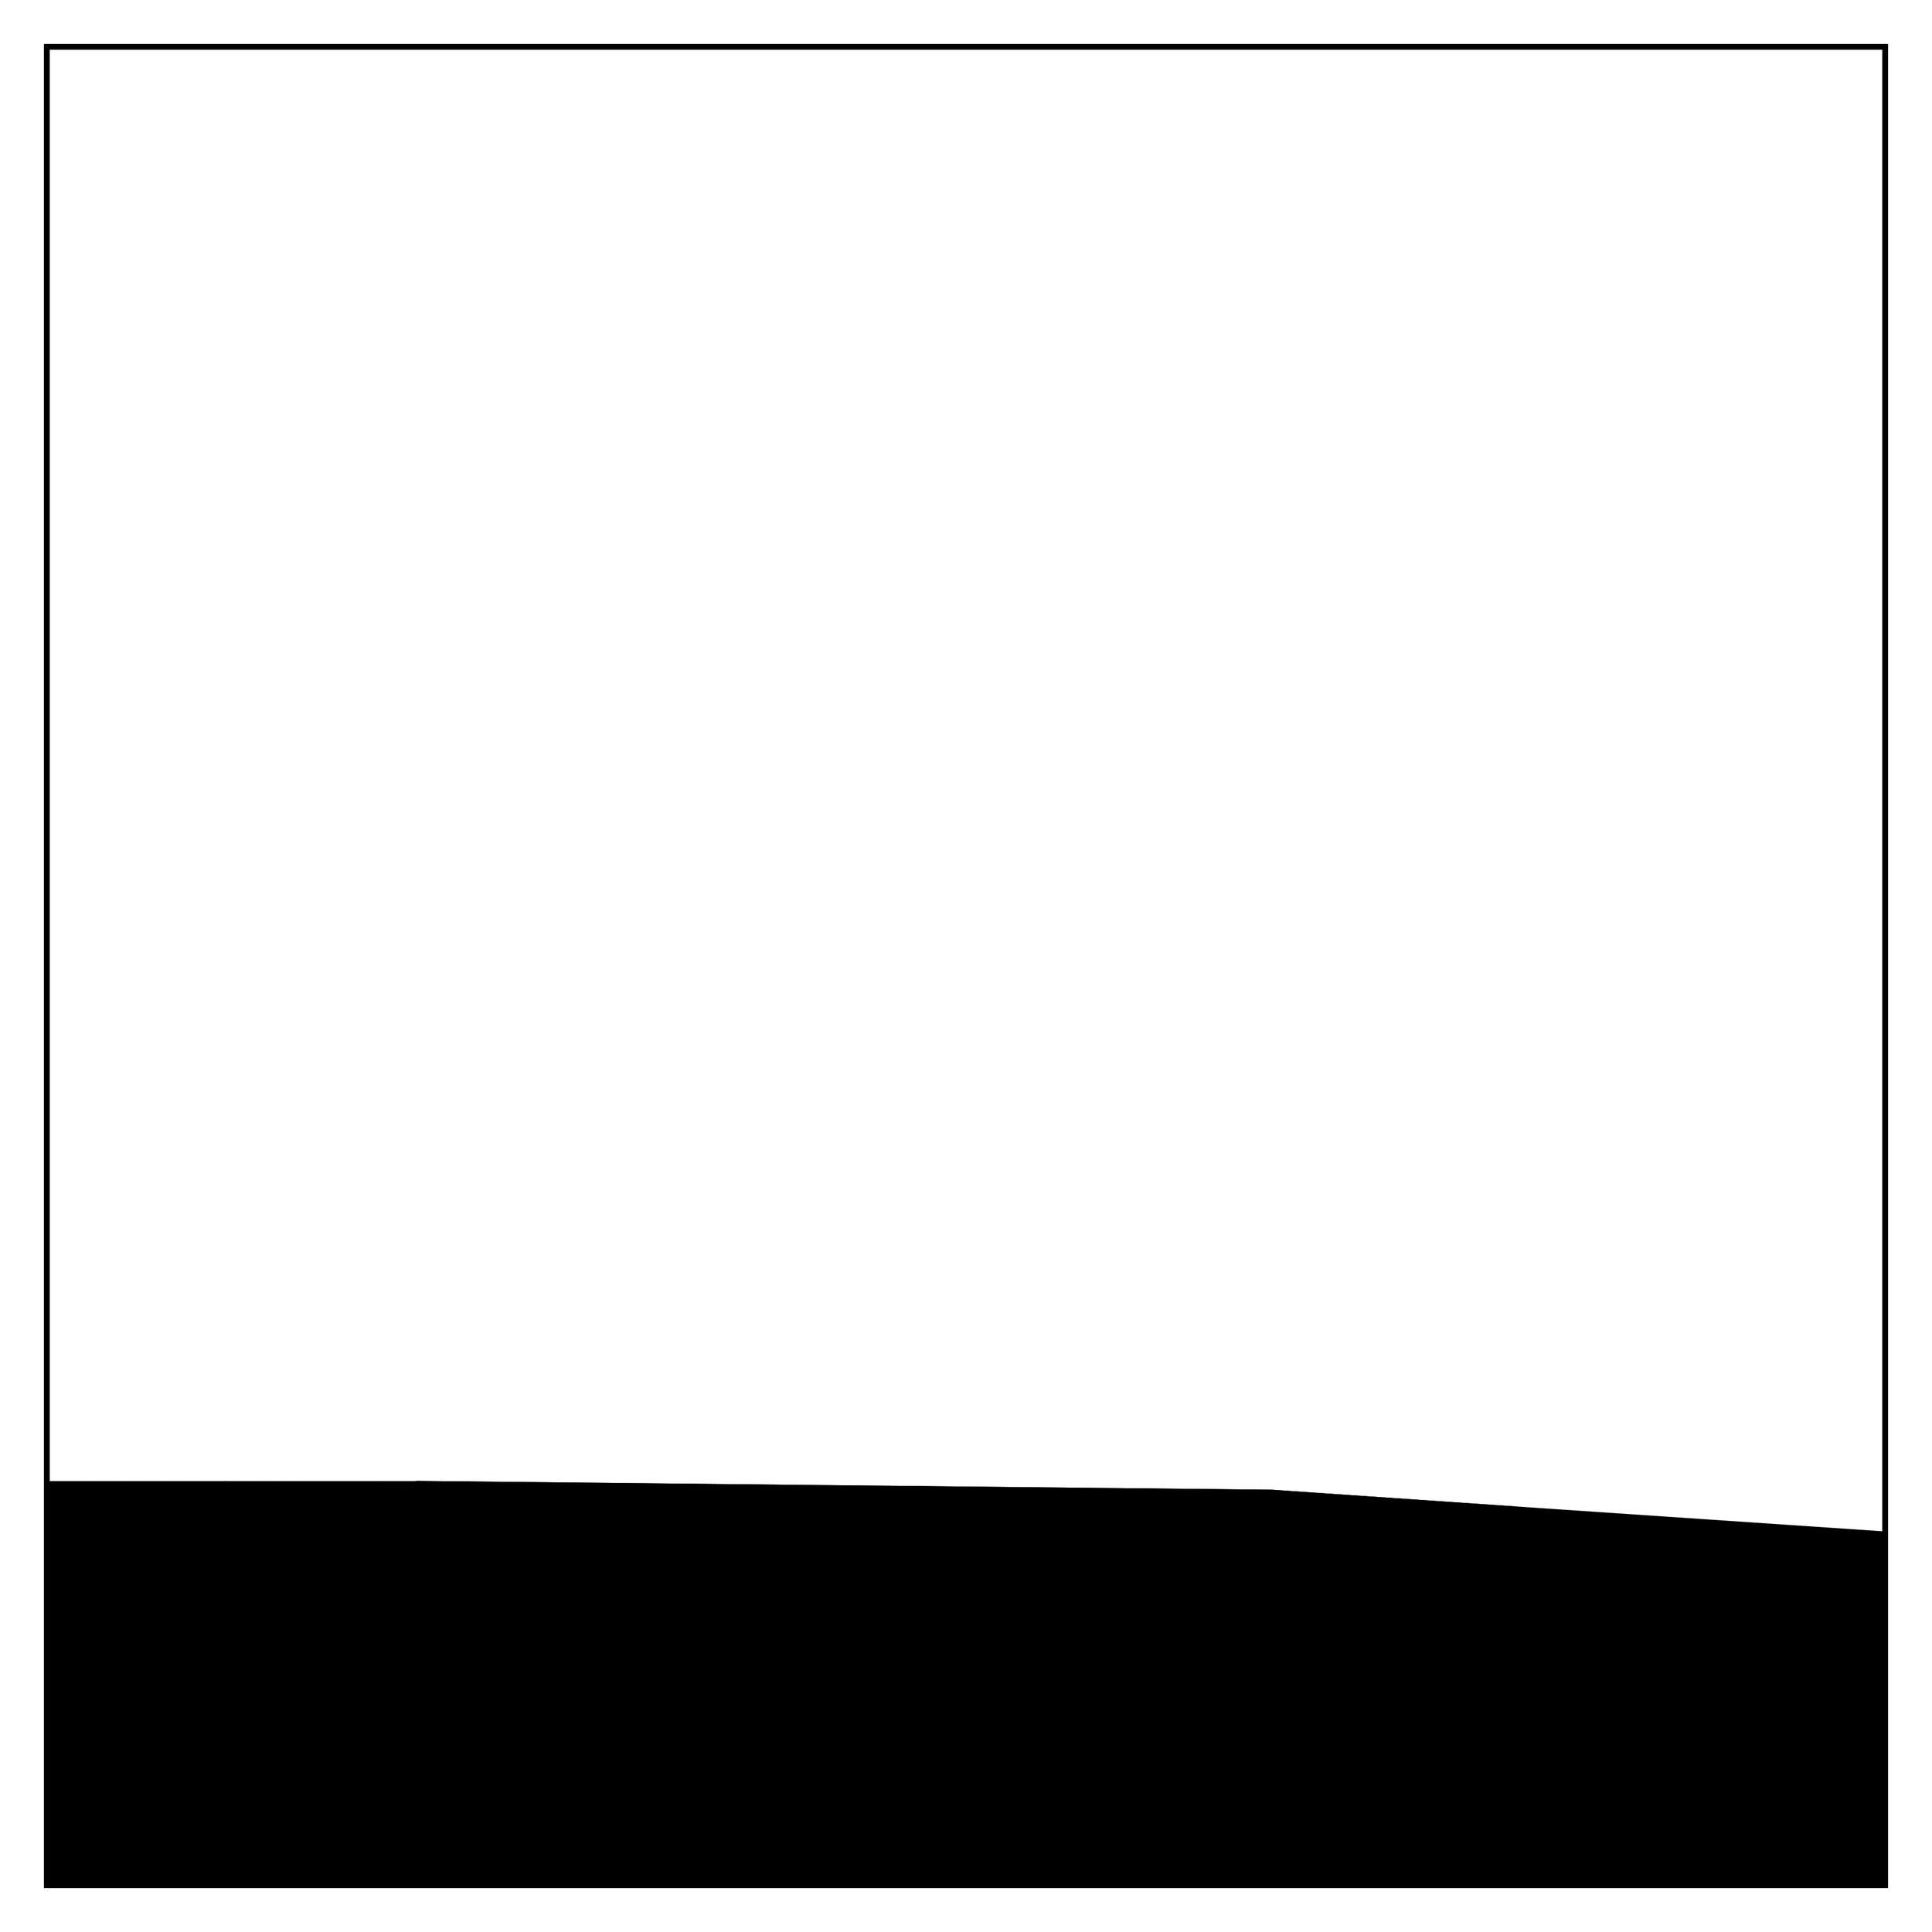 WH23_Front Elev 01.jpg